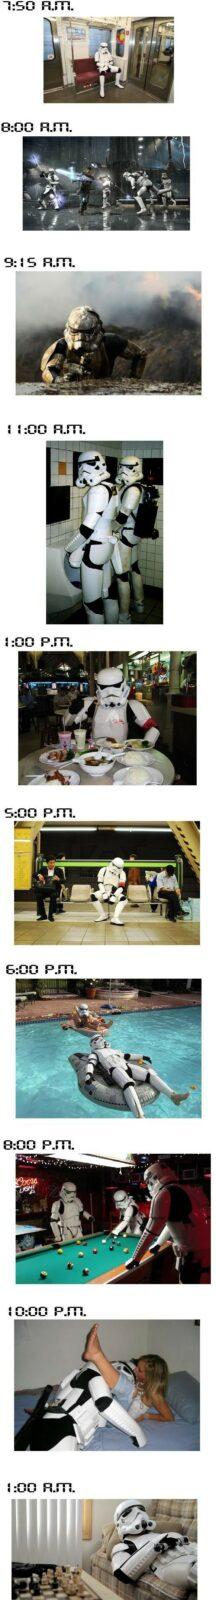 Stormtrooper  Como é a vida de um Stormtrooper, soldado de Star Wars